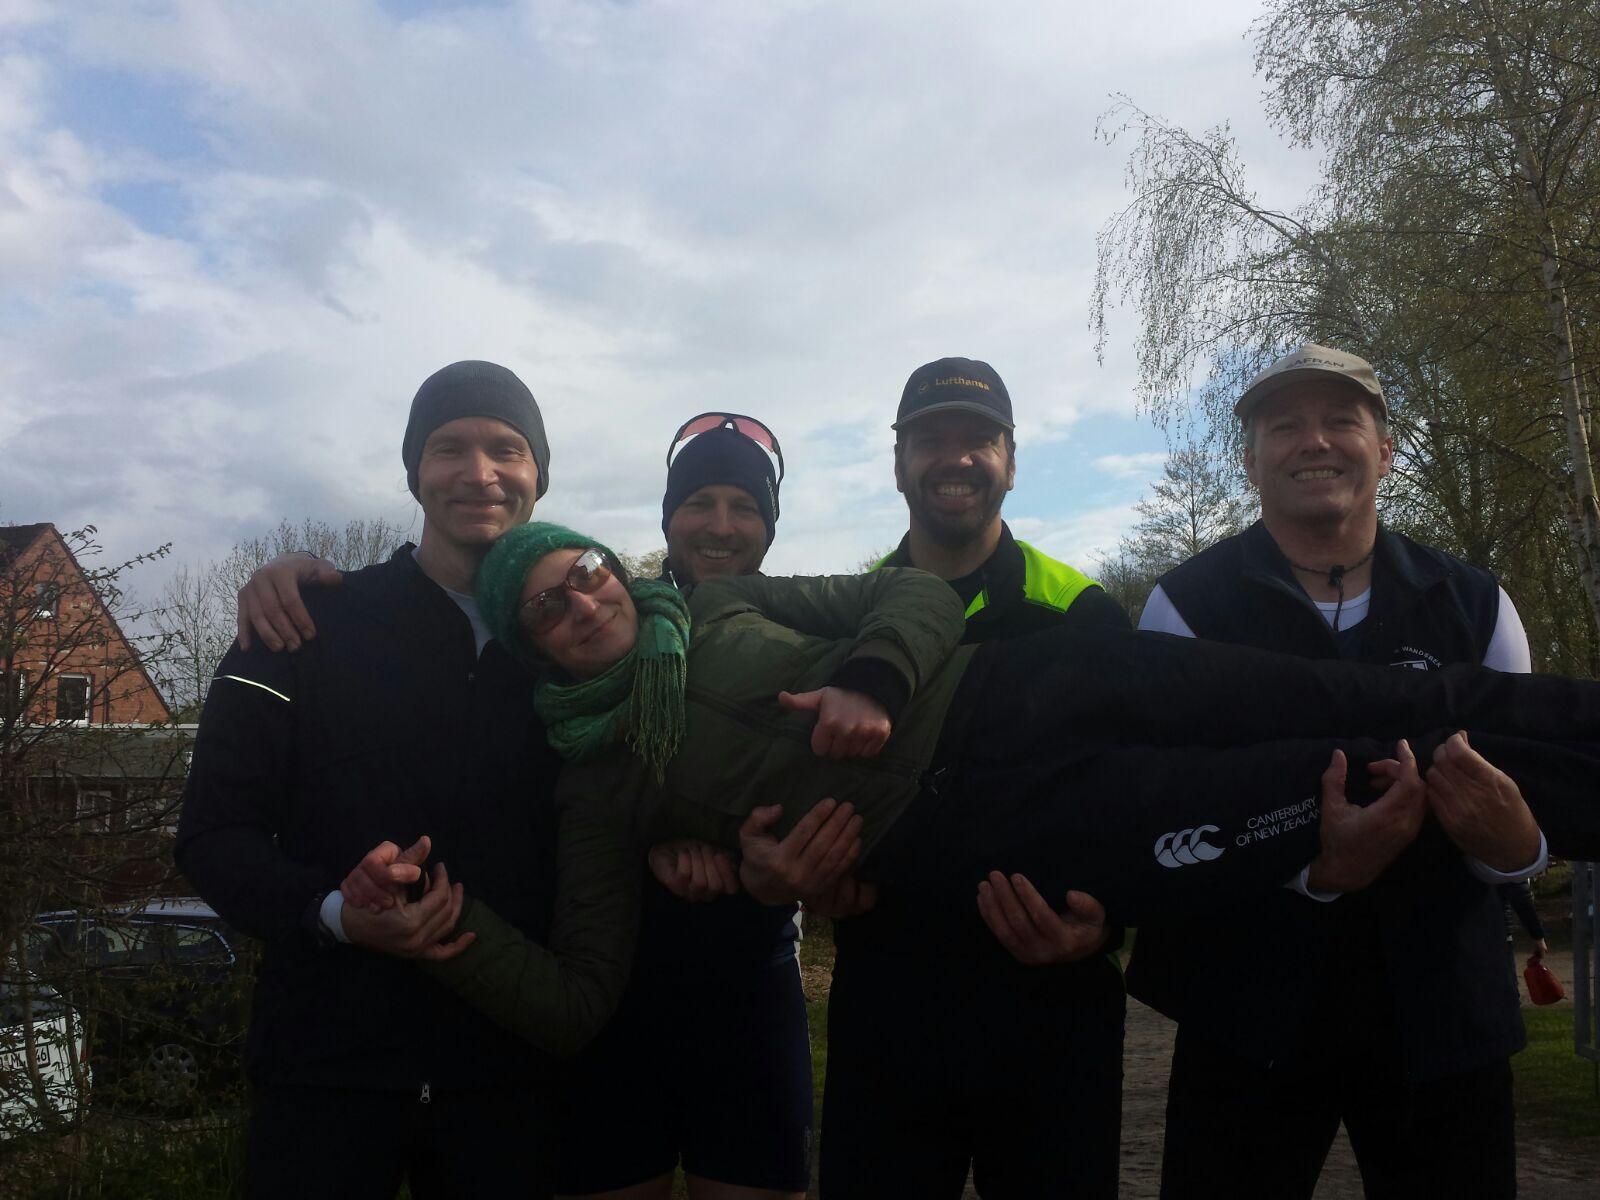 Michael Schade (Protesia), Alexander Liedtke (RG HANSA), Ansgar Heinze, Stephan Olesinski (WSV), Stuf. Katja Sauerbier (WSAP)